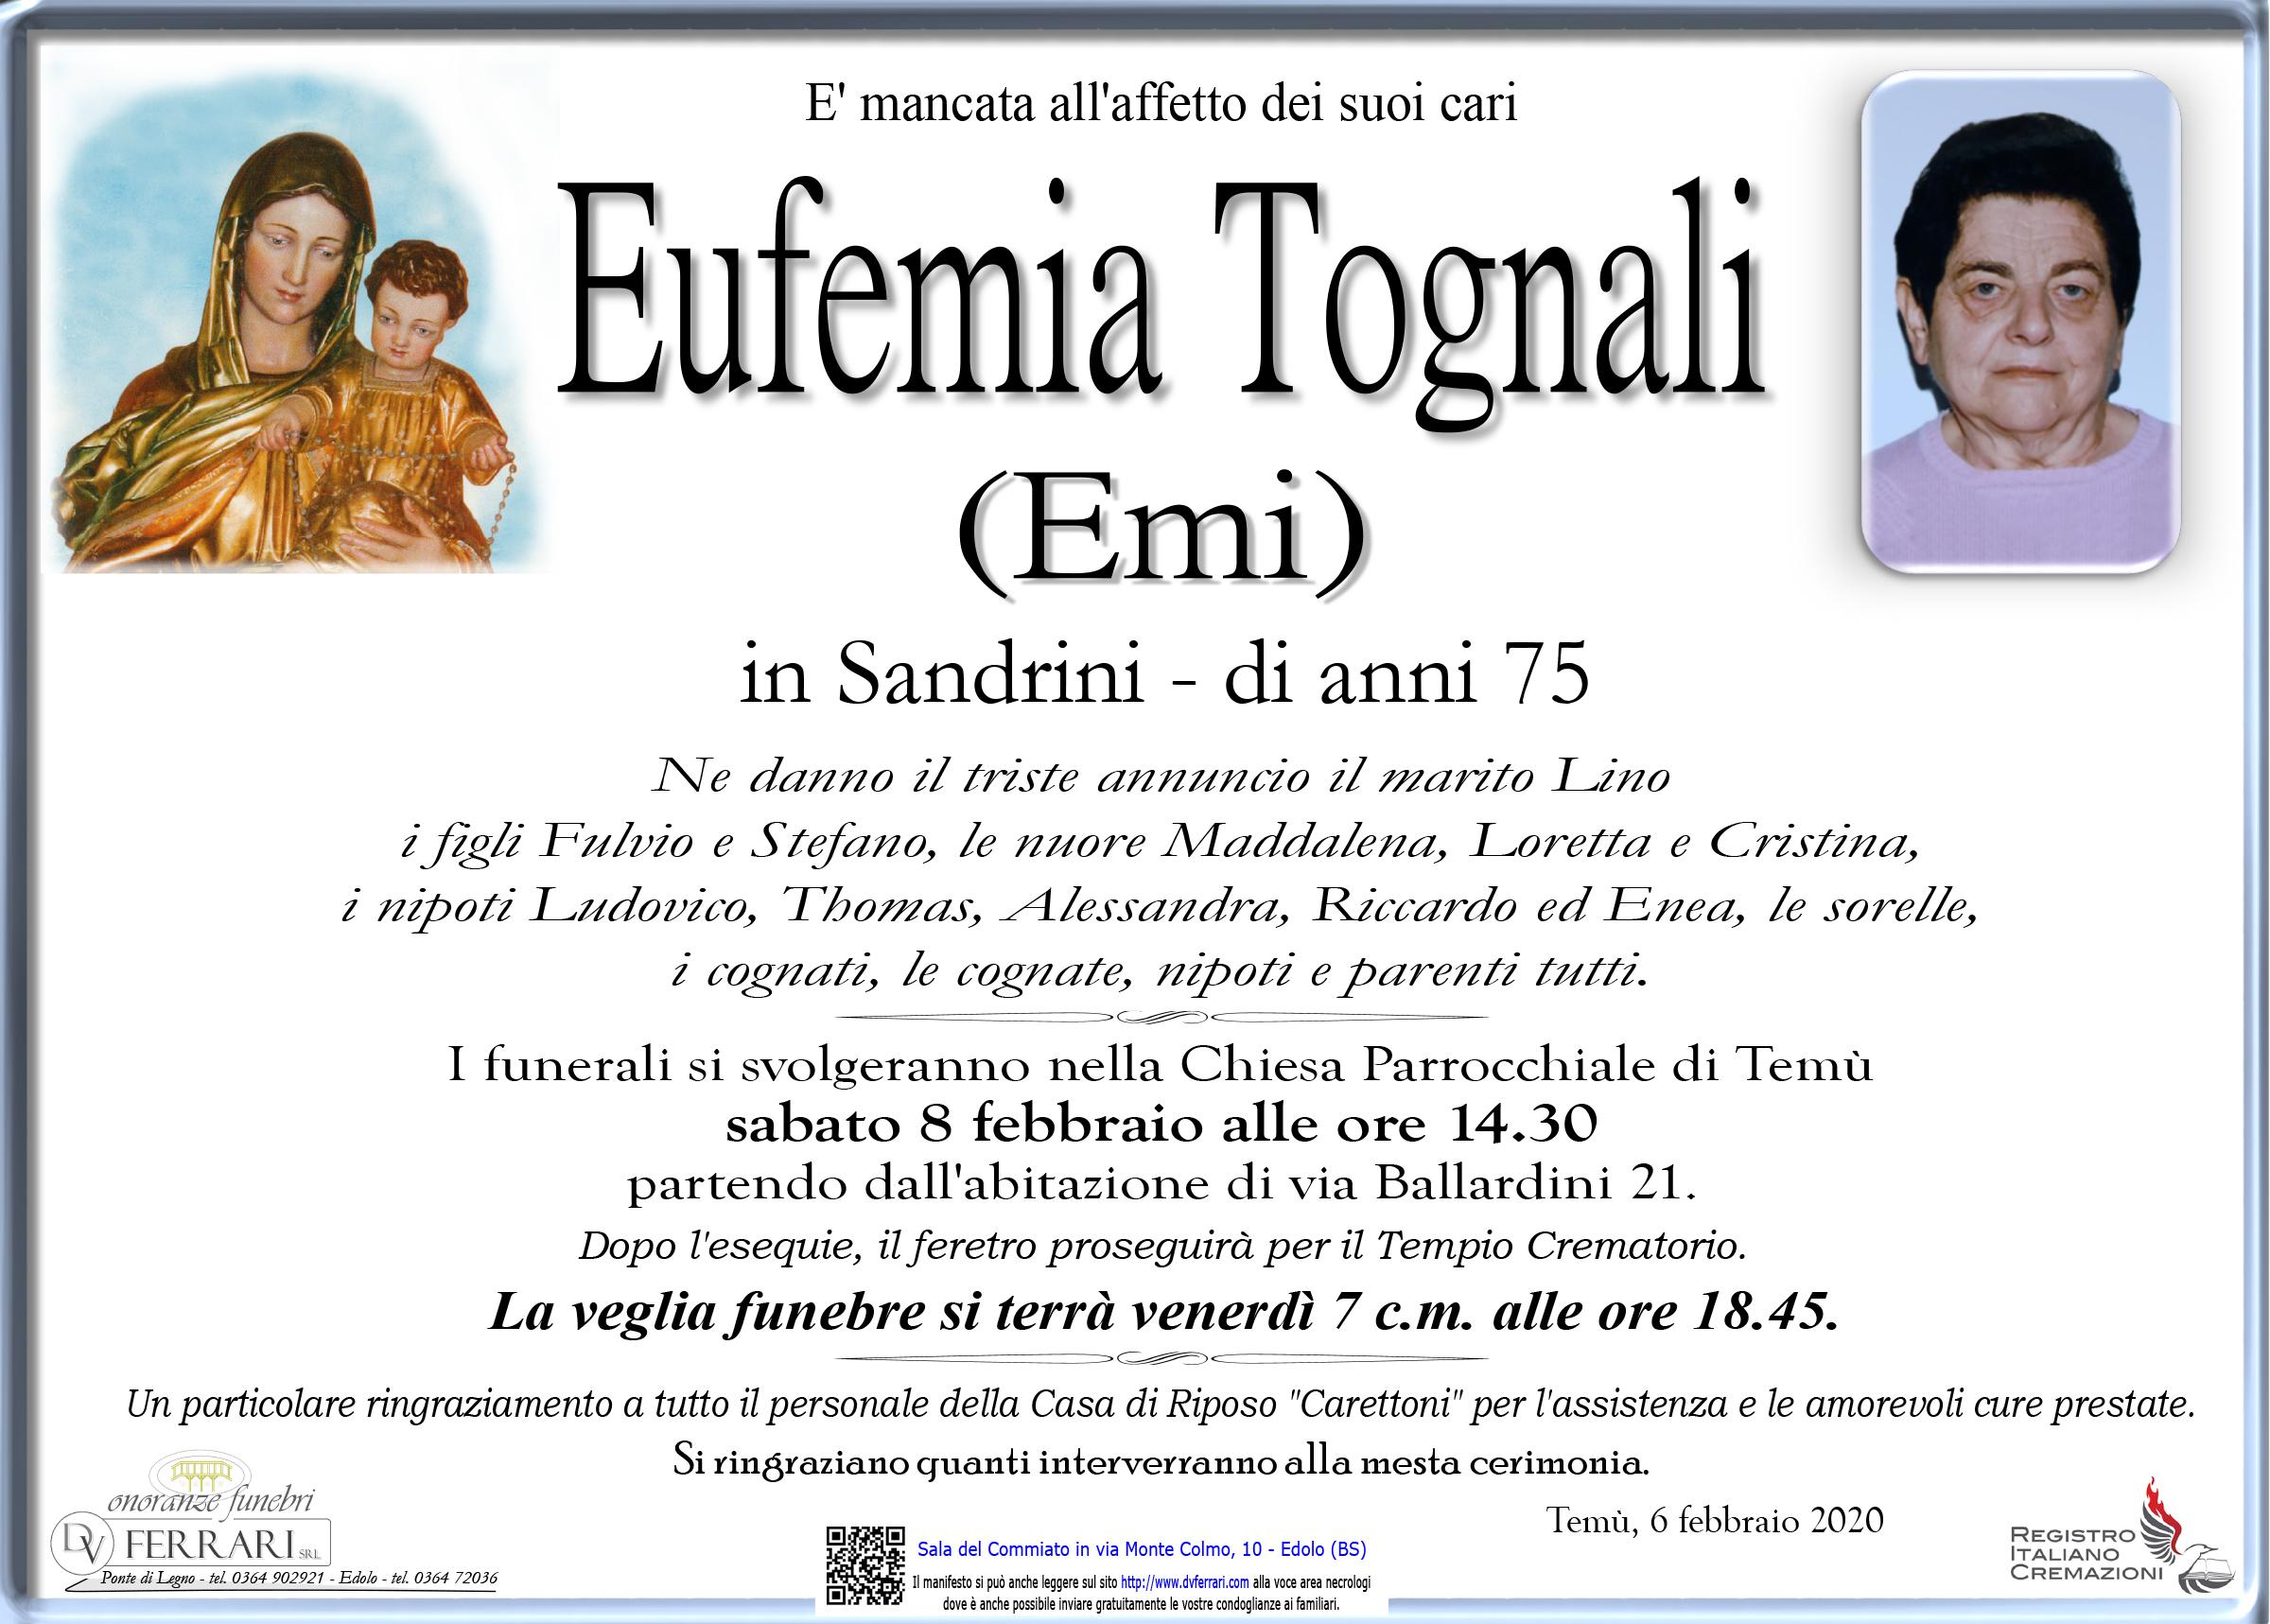 EUFEMIA TOGNALI (EMI) IN SANDRINI - TEMU'